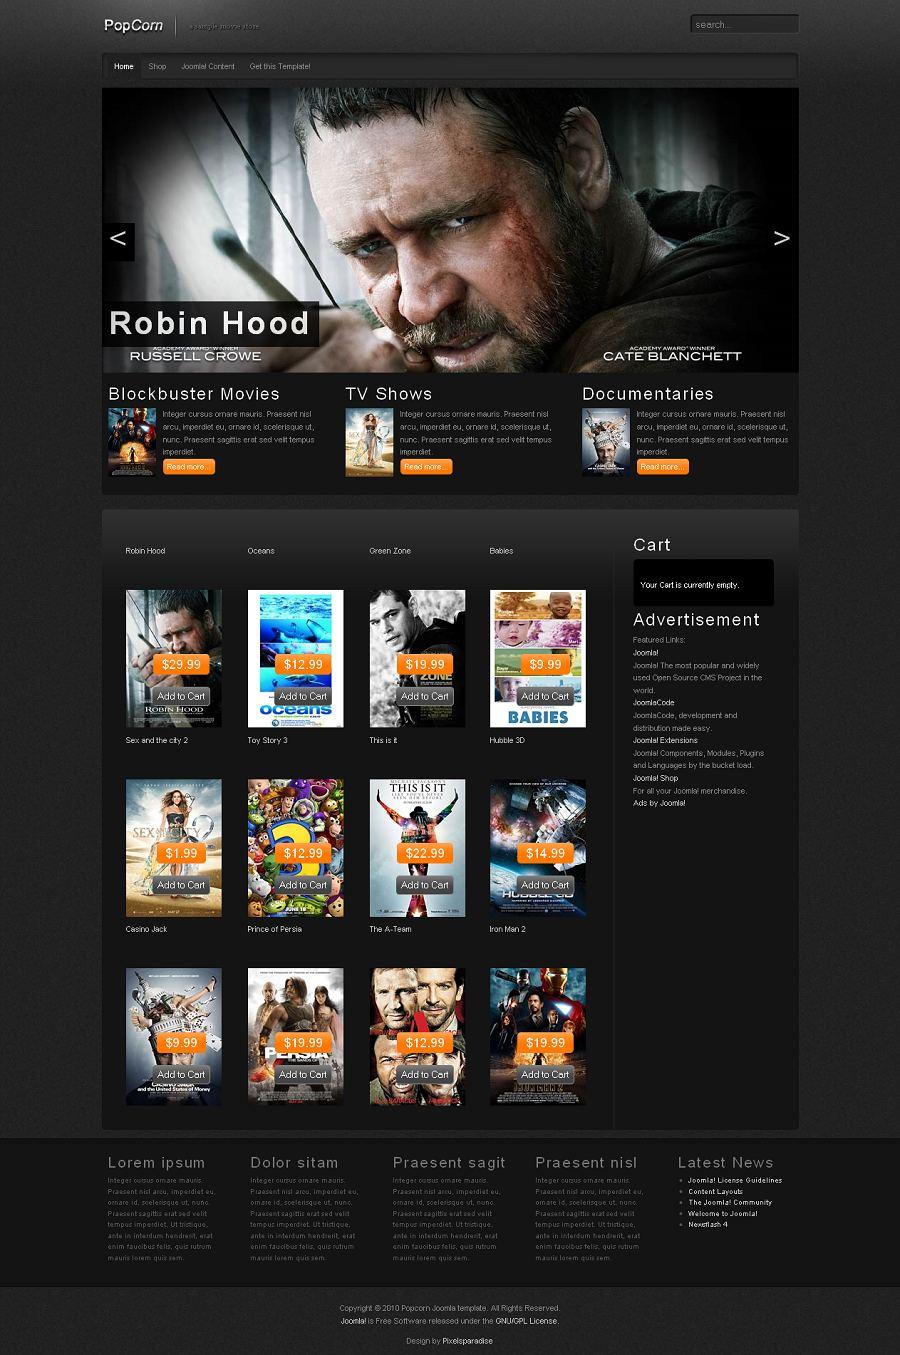 PopCorn Joomla 1.5 Template, Joomla Music, Video Themes - Pixels ...